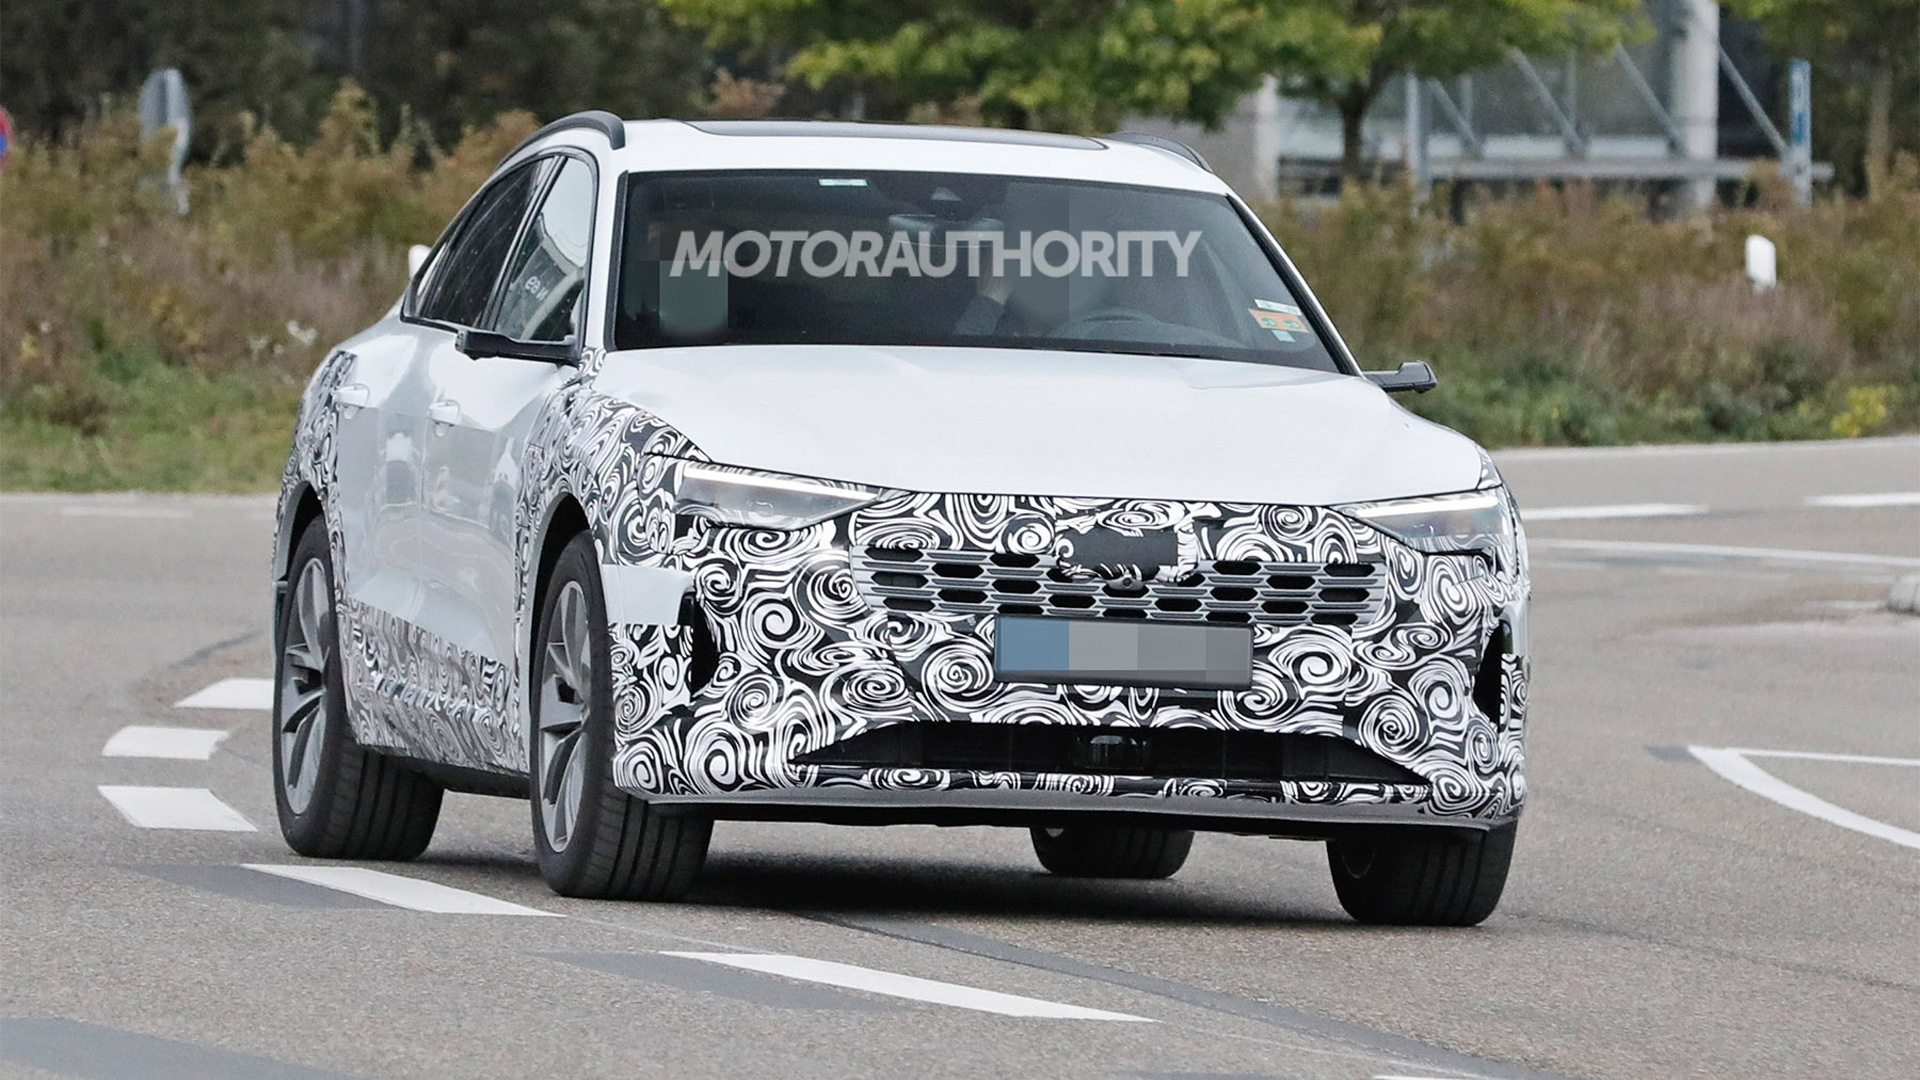 2023 Audi E-Tron Sportback facelift spy shots - Photo credit:S. Baldauf/SB-Medien